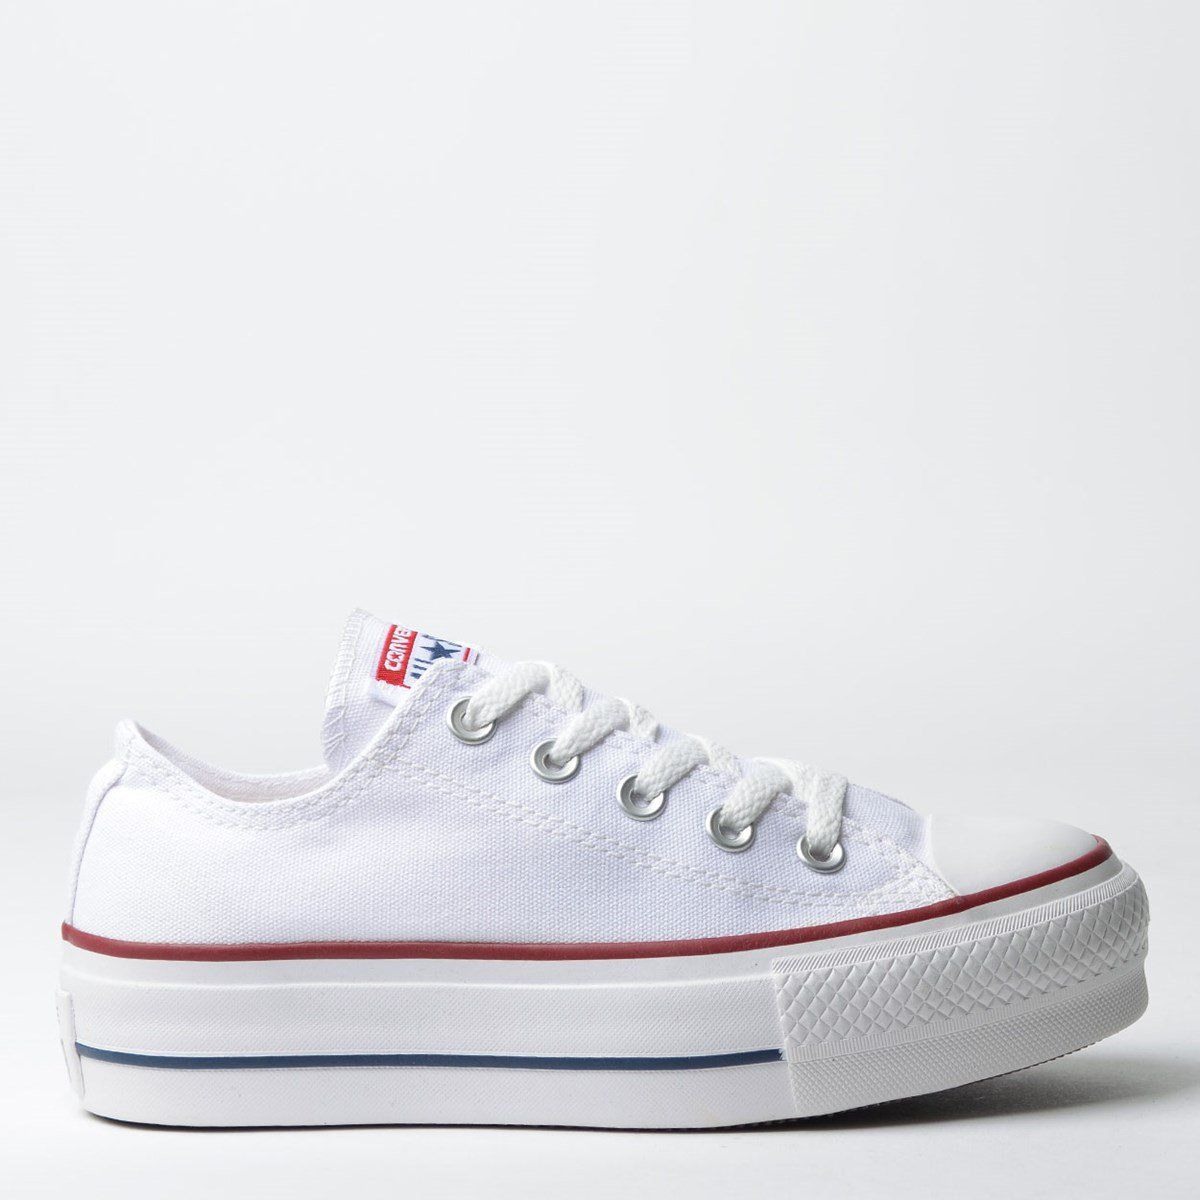 Tênis Converse Chuck Taylor All Star Plataforma Branco/Branco/Marinho